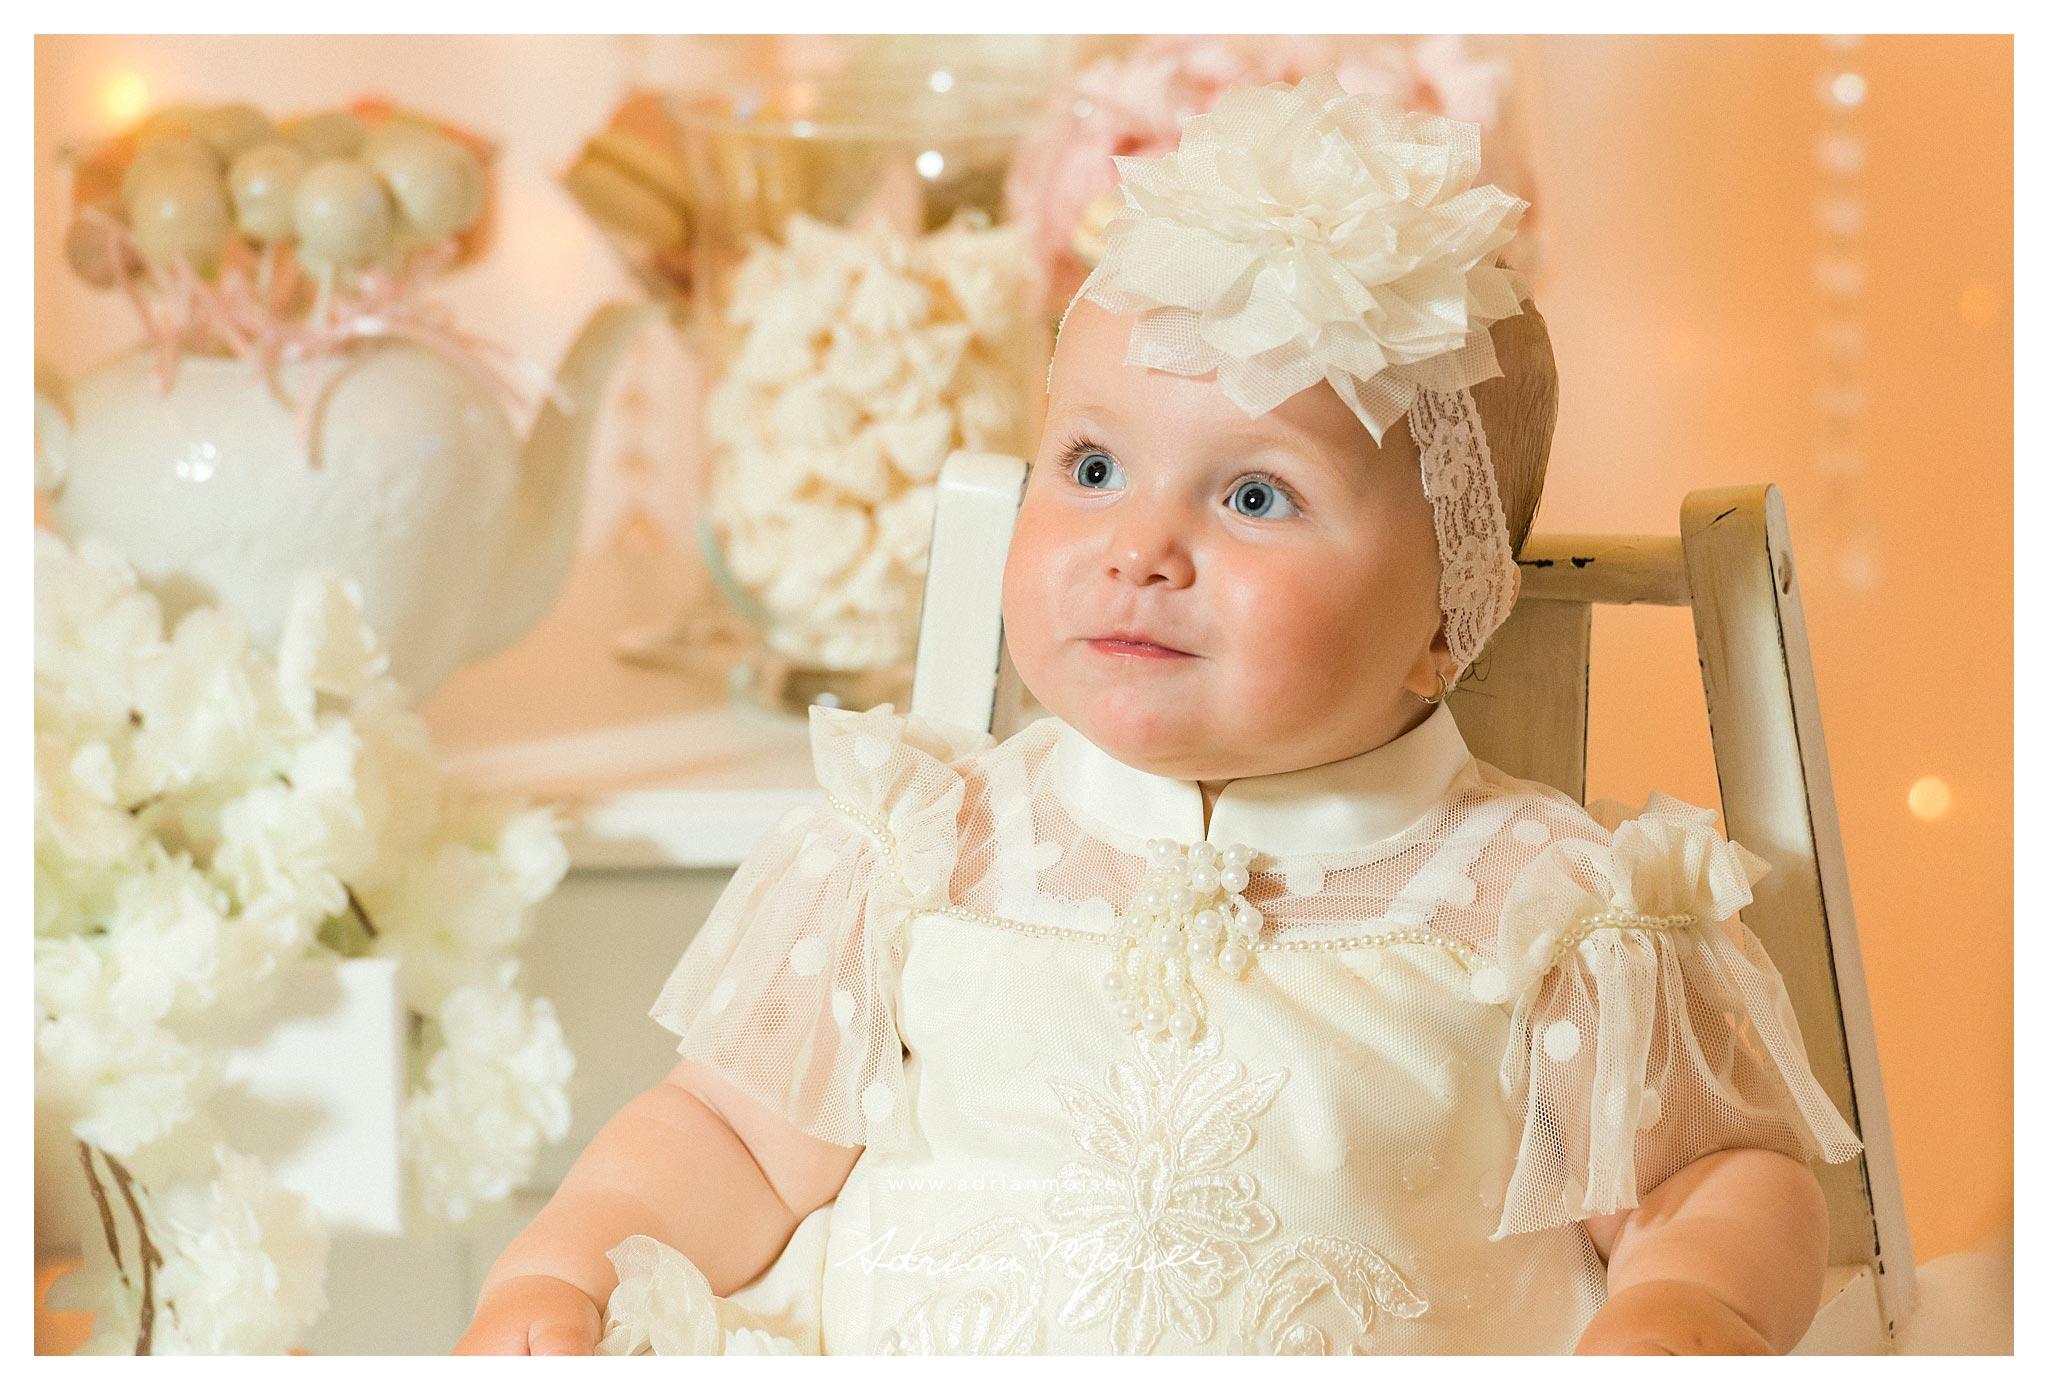 Portret de copil la petrecerea de 1 an, fetita in rochita de printesa, fotograf cumatrie Iasi Adrian Moisei